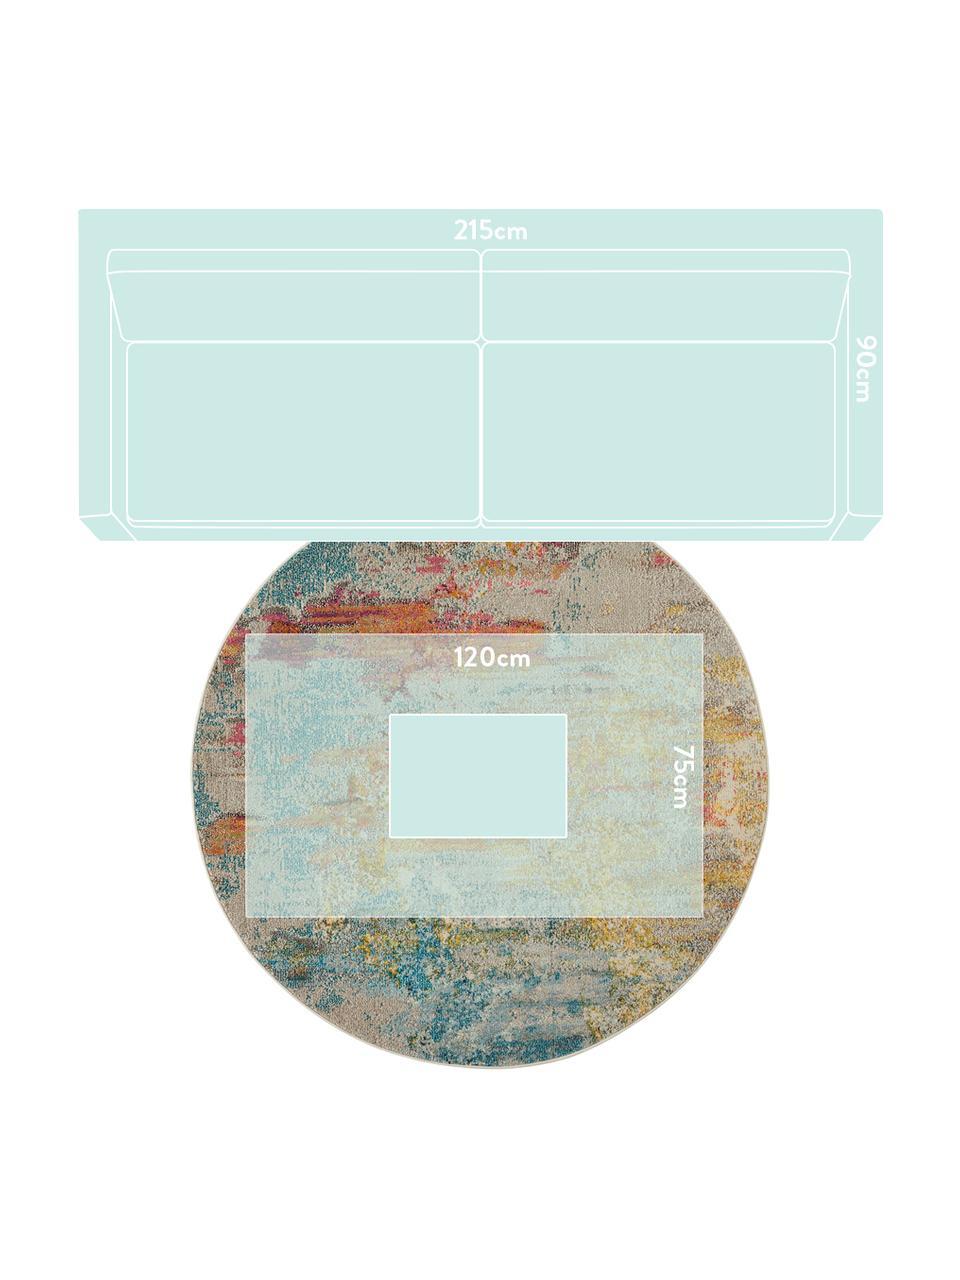 Runder Designteppich Celestial in Bunt, Flor: 100% Polypropylen, Mehrfarbig, Ø 160 cm (Größe L)